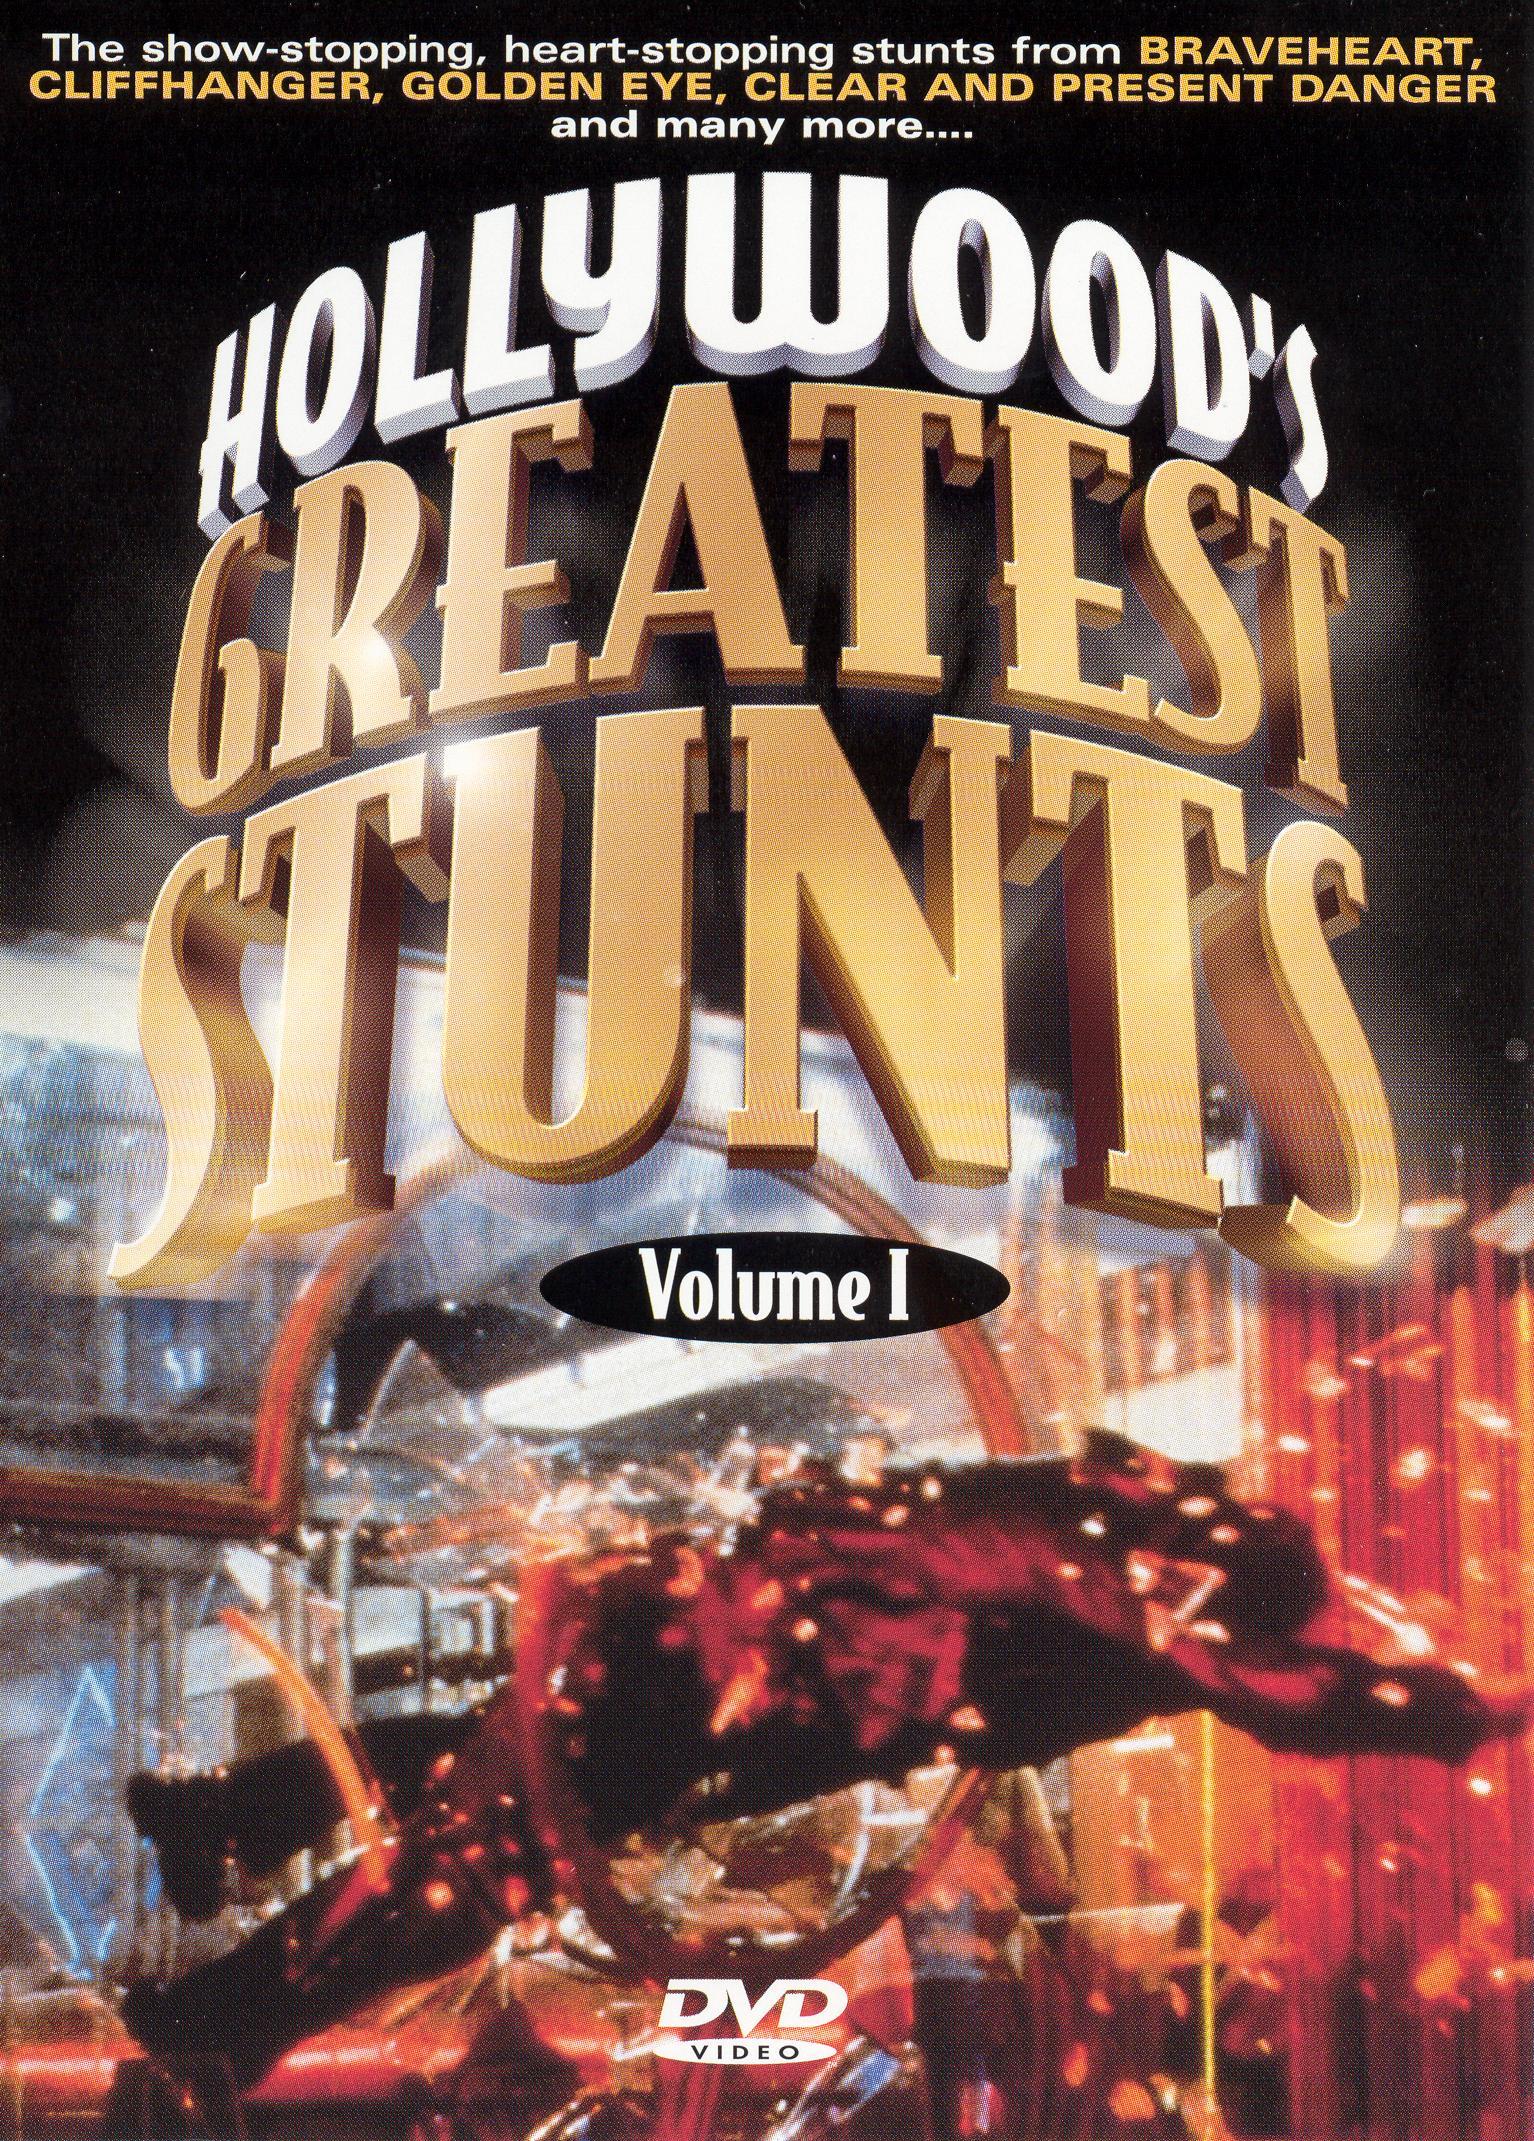 Hollywood's Greatest Stunts, Vol. 1